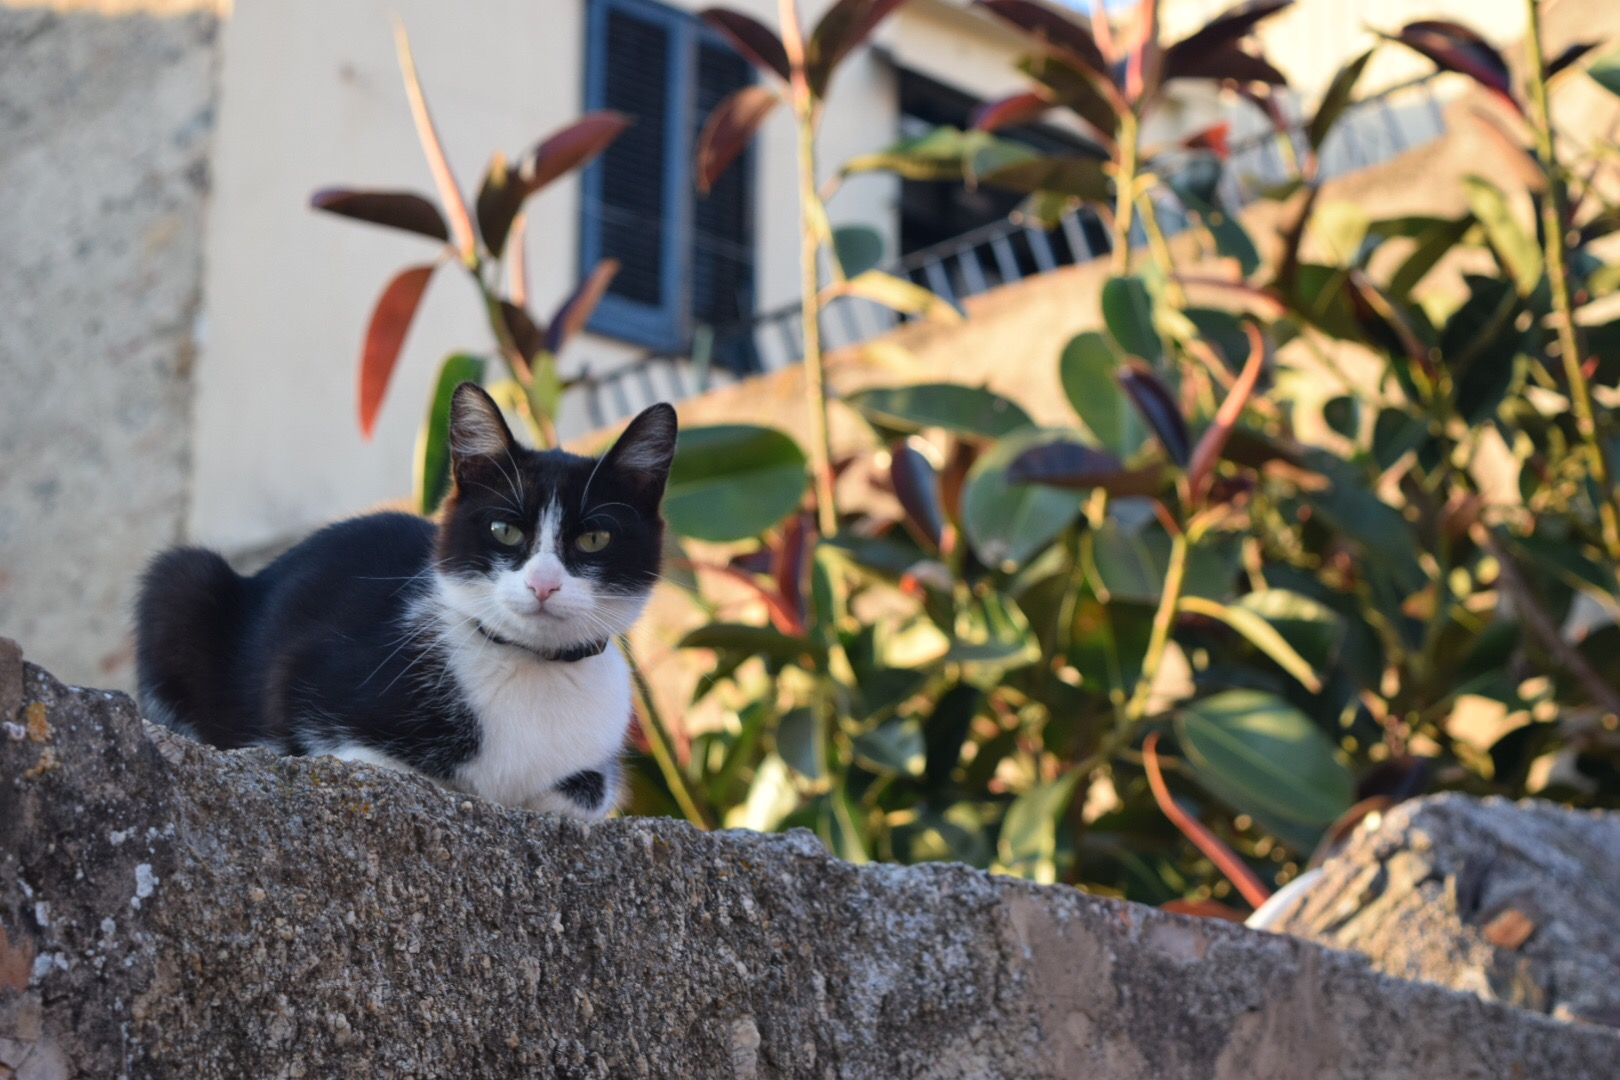 Proctor en Segovia stays in a rural northern Catalan town